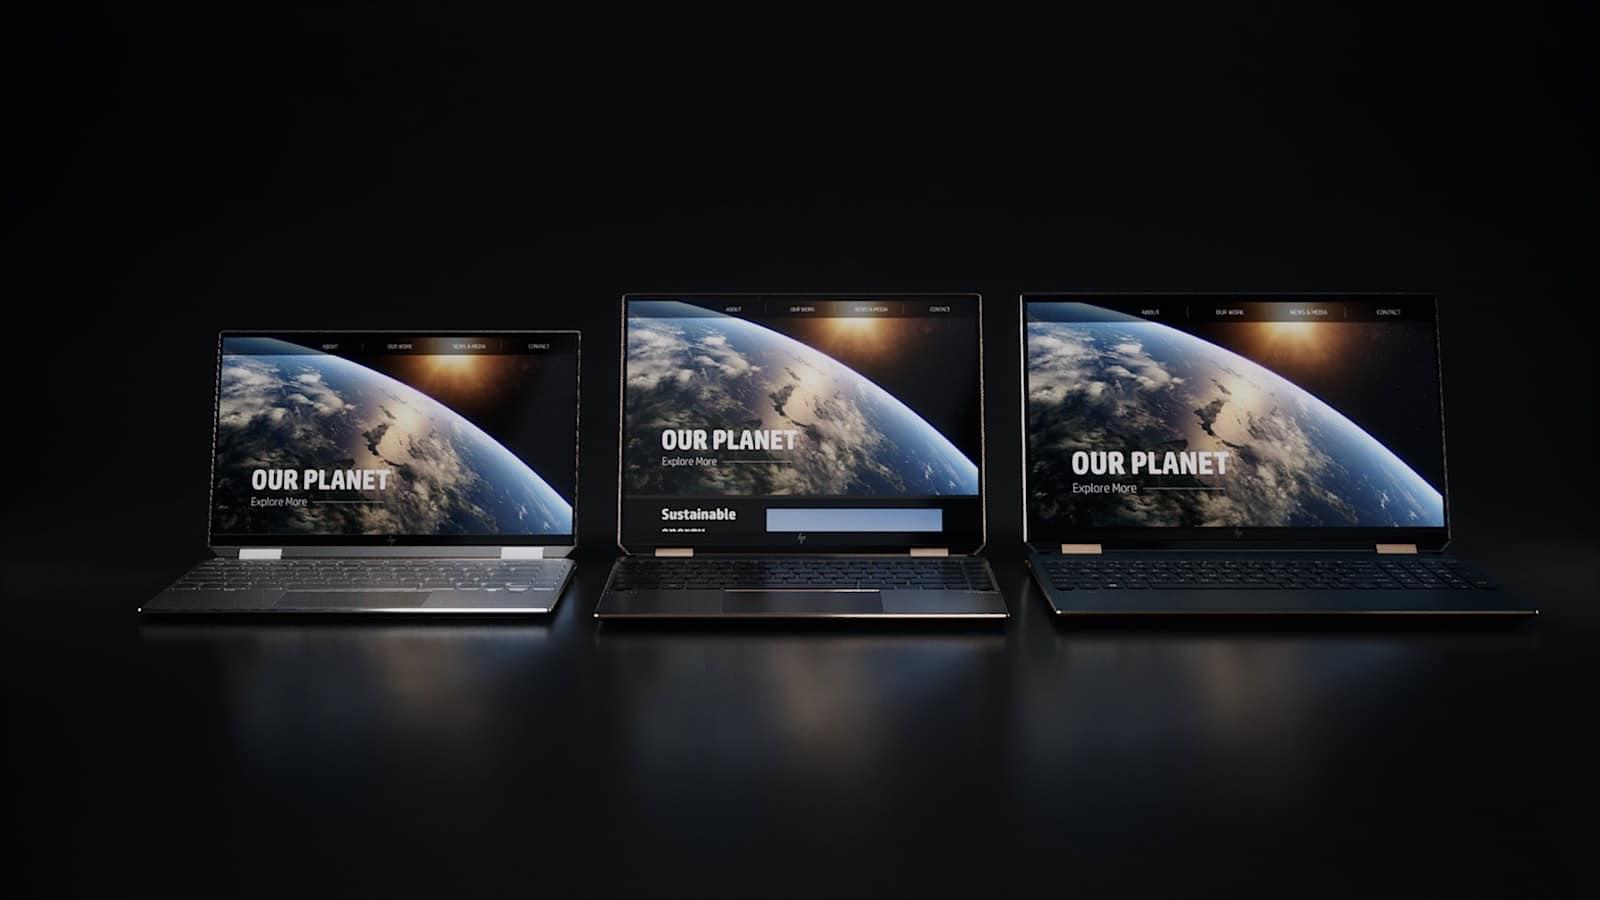 The HP Spectre x360 range